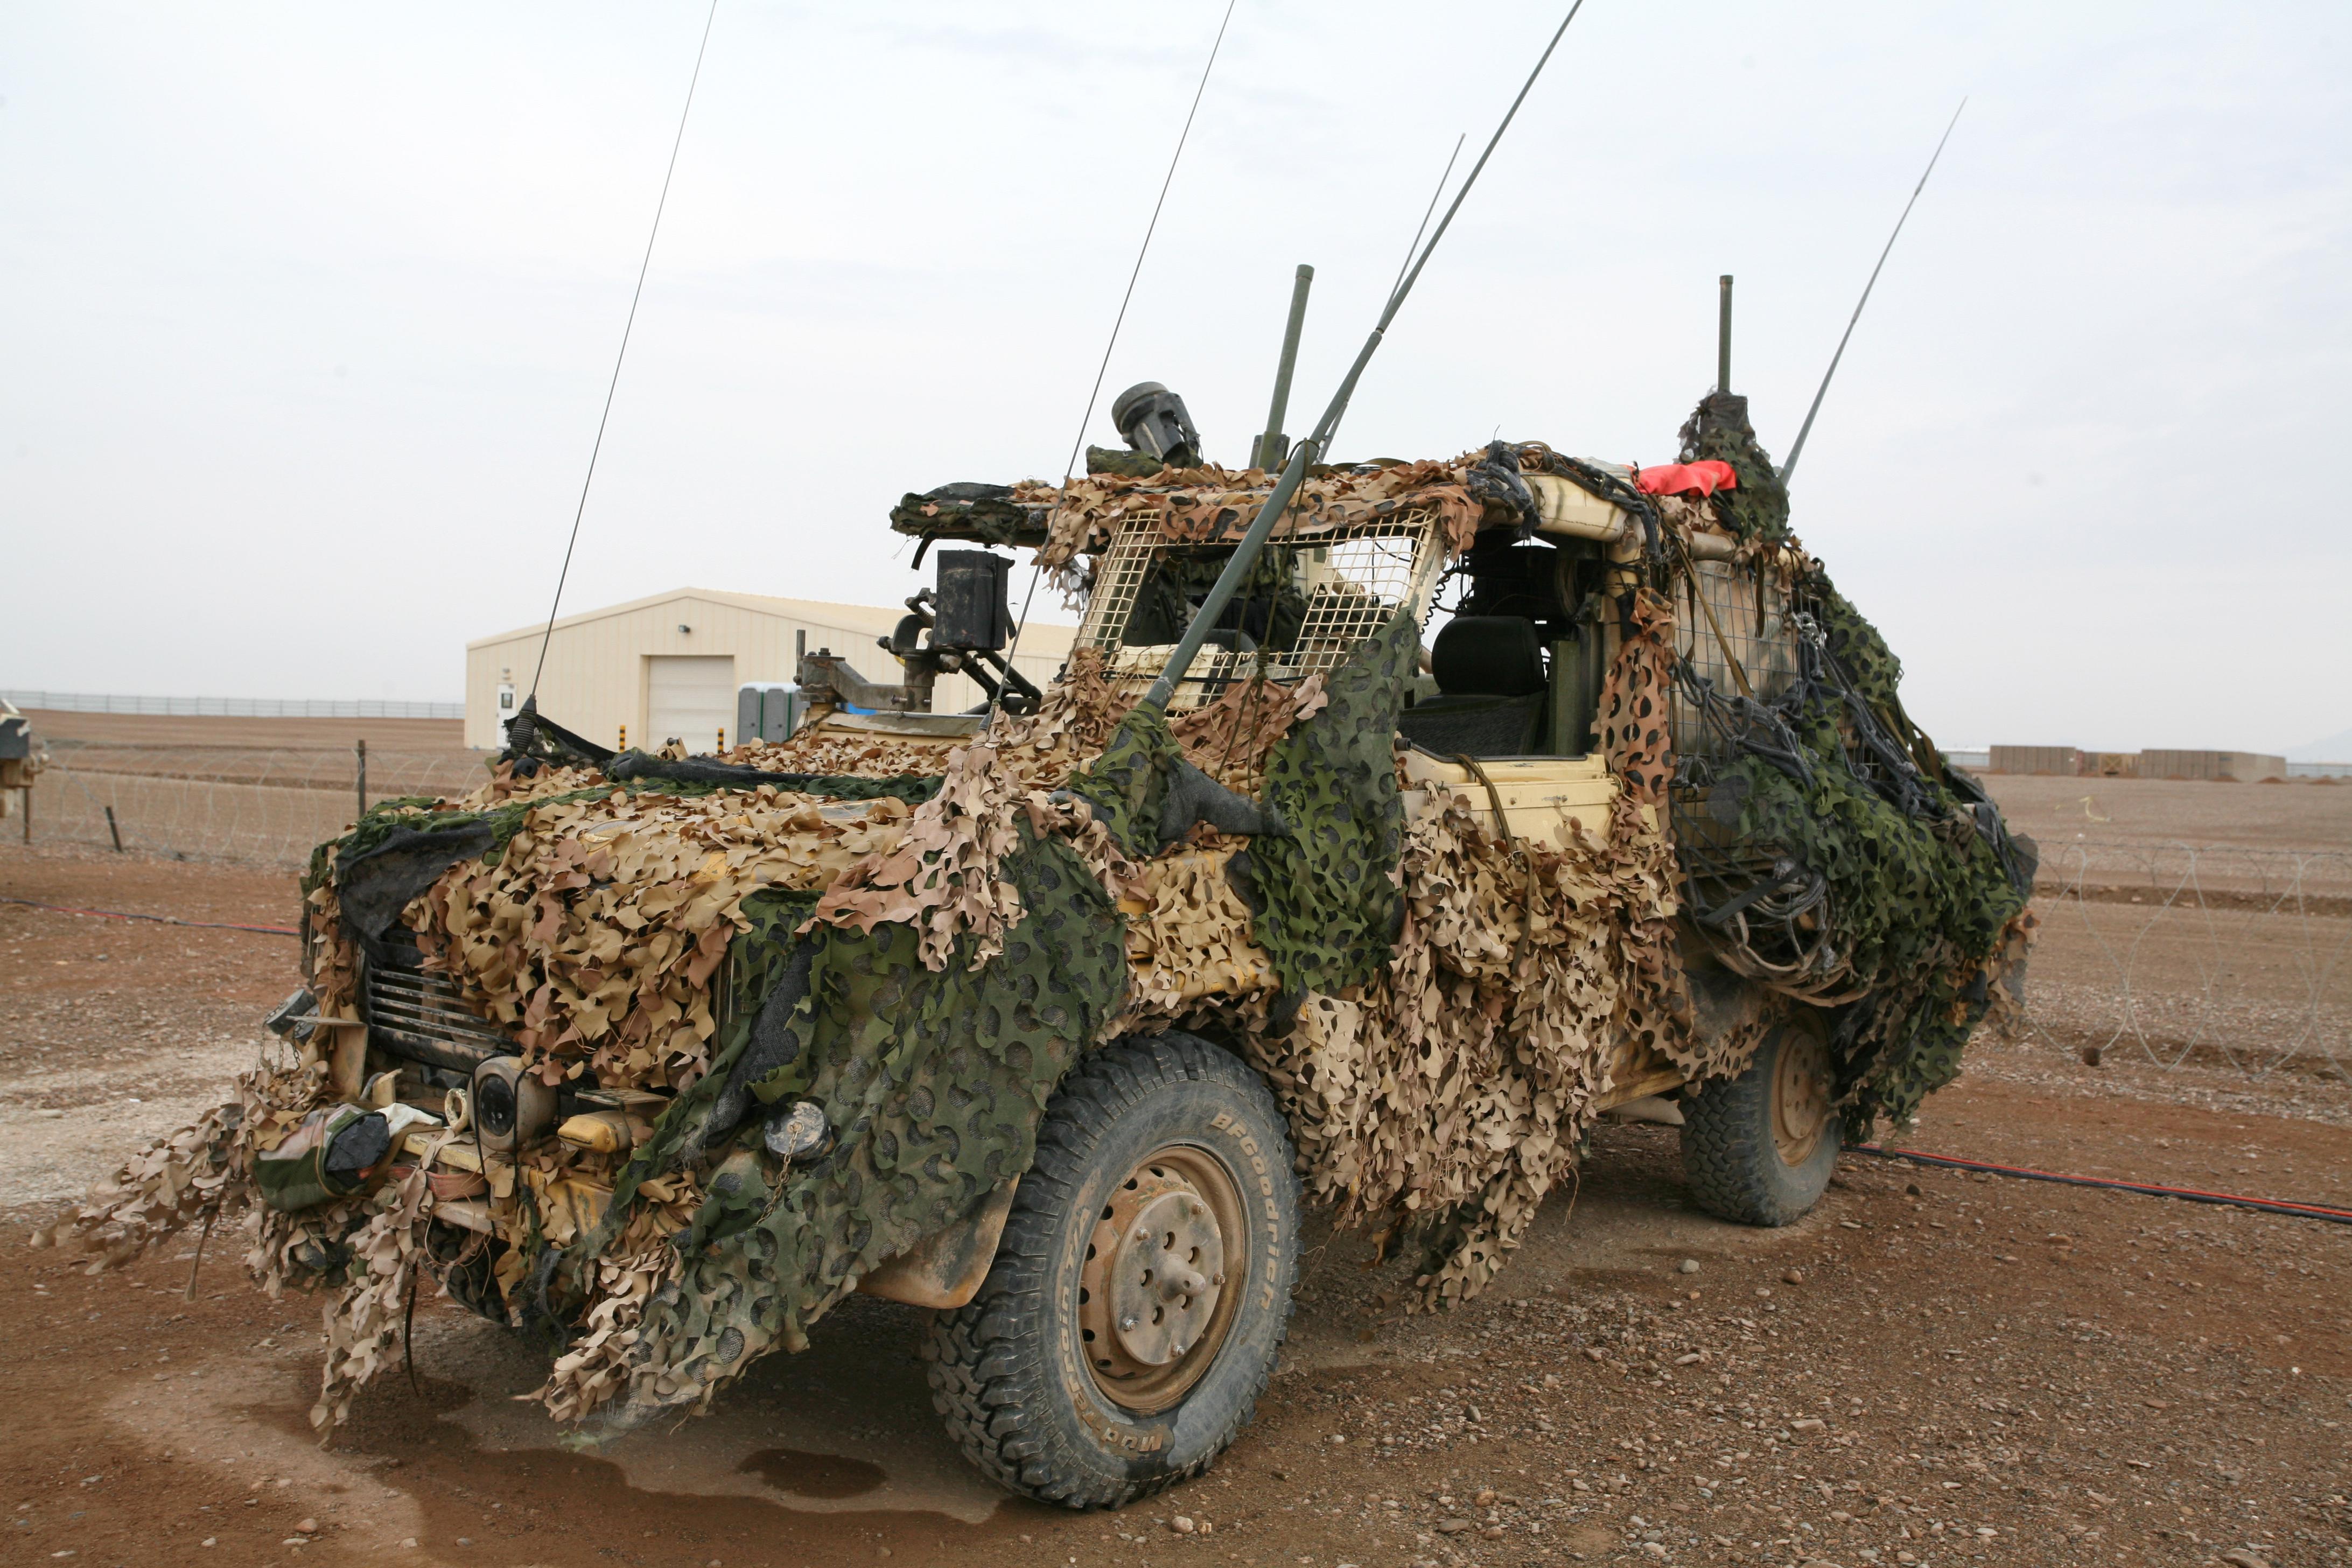 A vehicle ready for patrol. Photo: HOK/Per A. Rasmussen, 2008